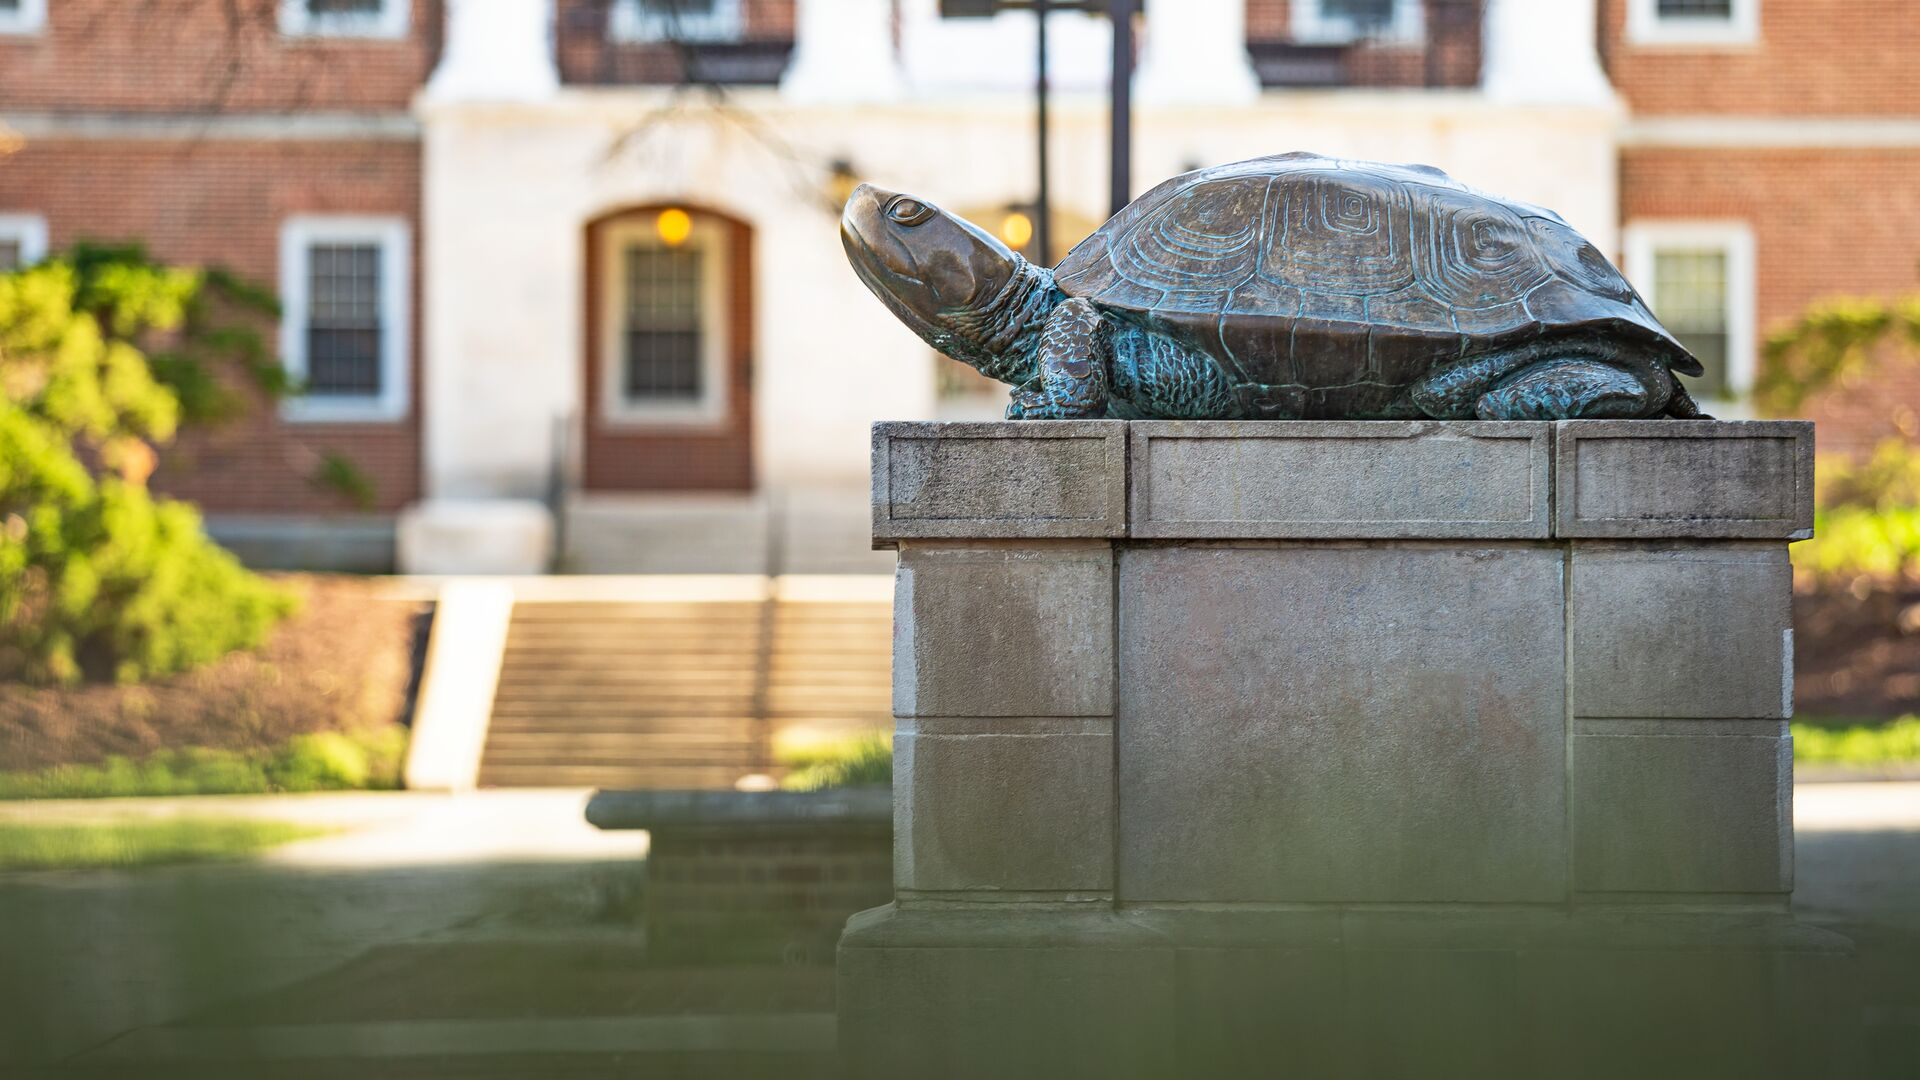 Testudo statue in front of McKeldin Library.